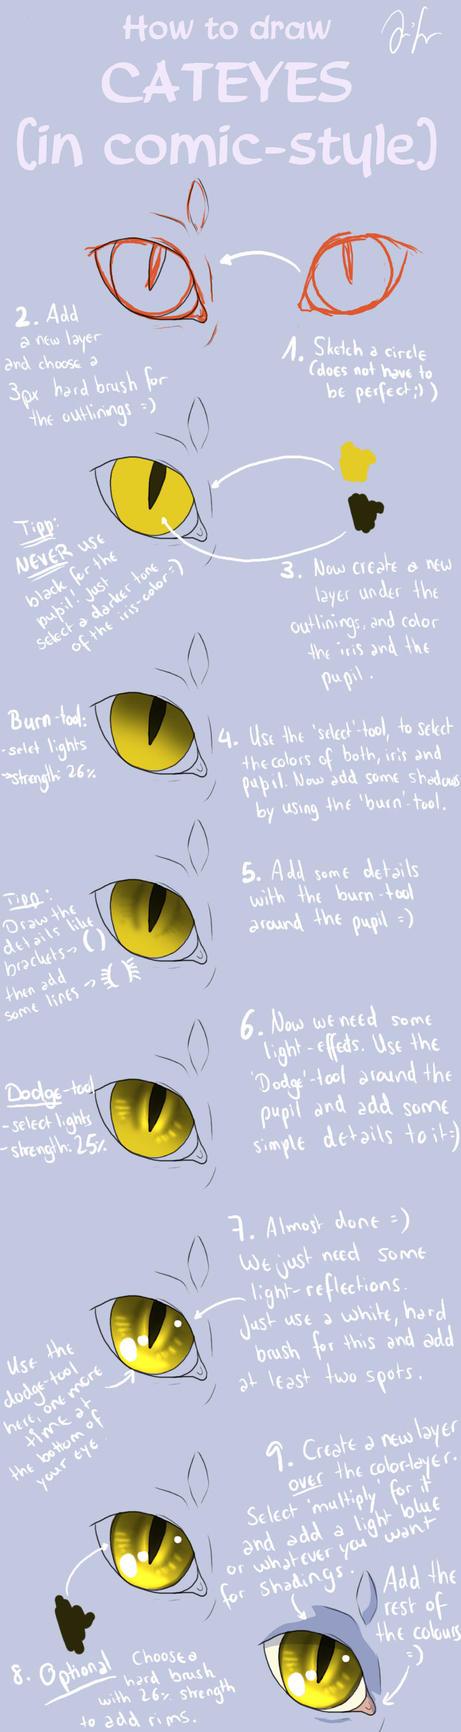 Cat Eye Tutorial (comic-style) by Mizu-no-Akira